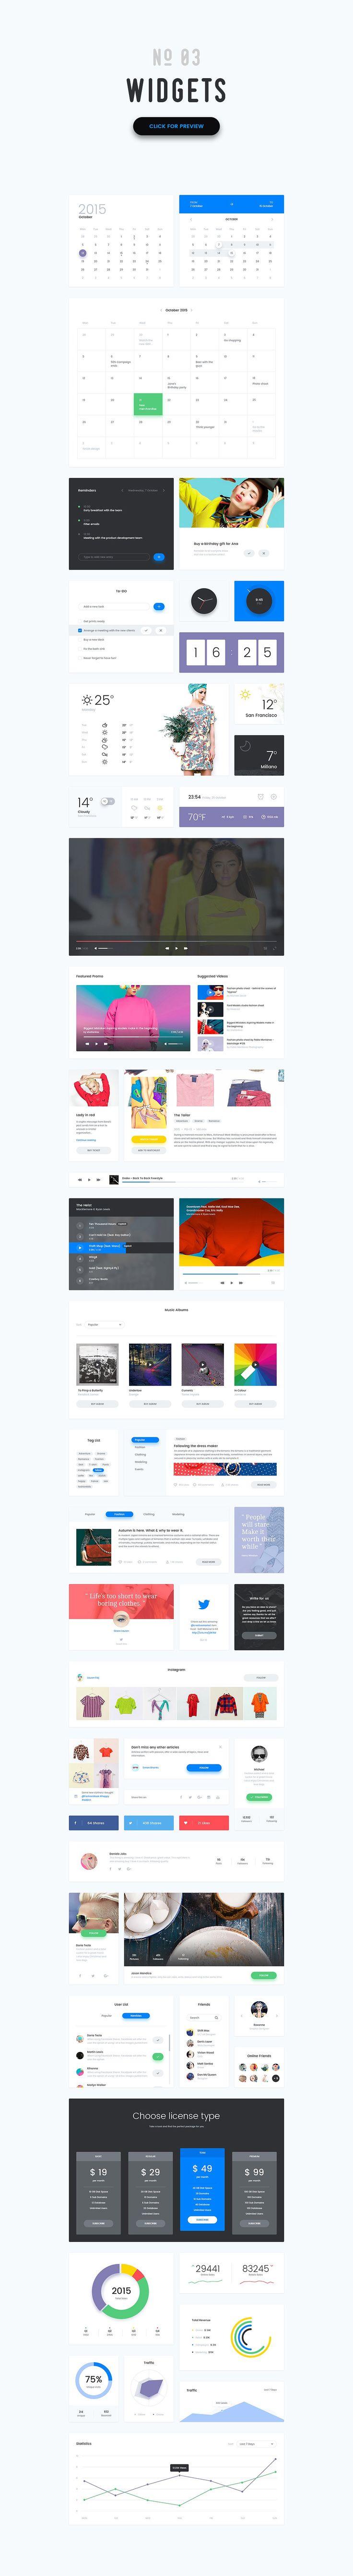 -50%- Vivid - Soft Material UI Kit - Web Elements - 6